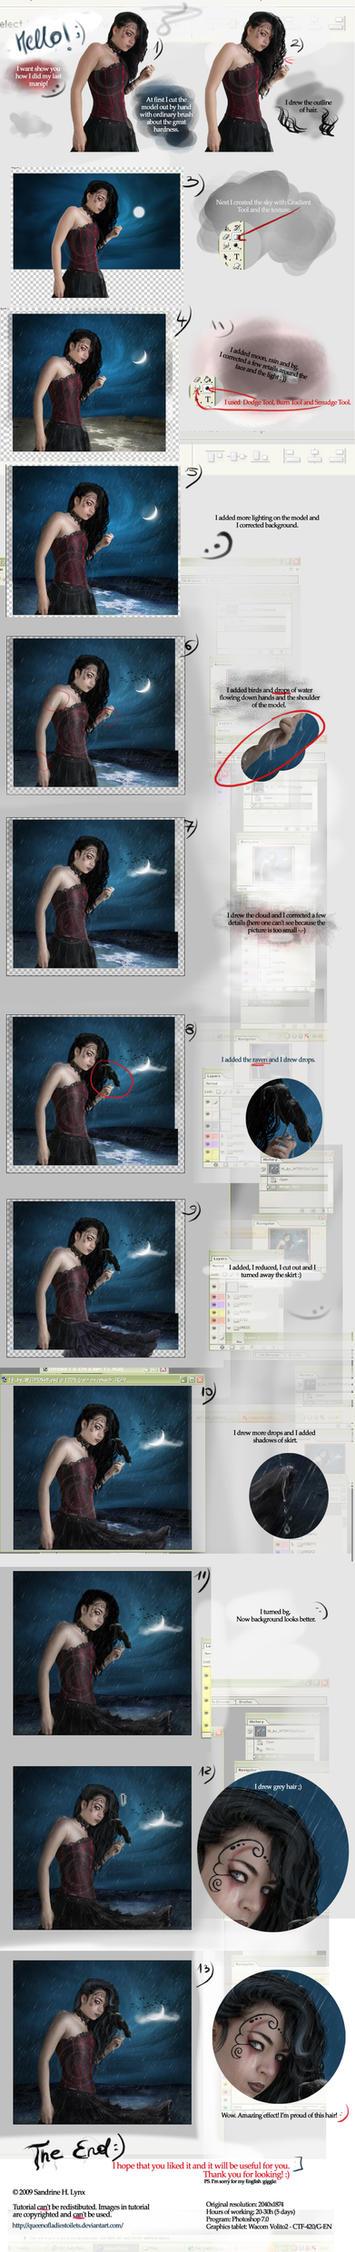 - Photomanipulation Tutorial - by SandyLynx